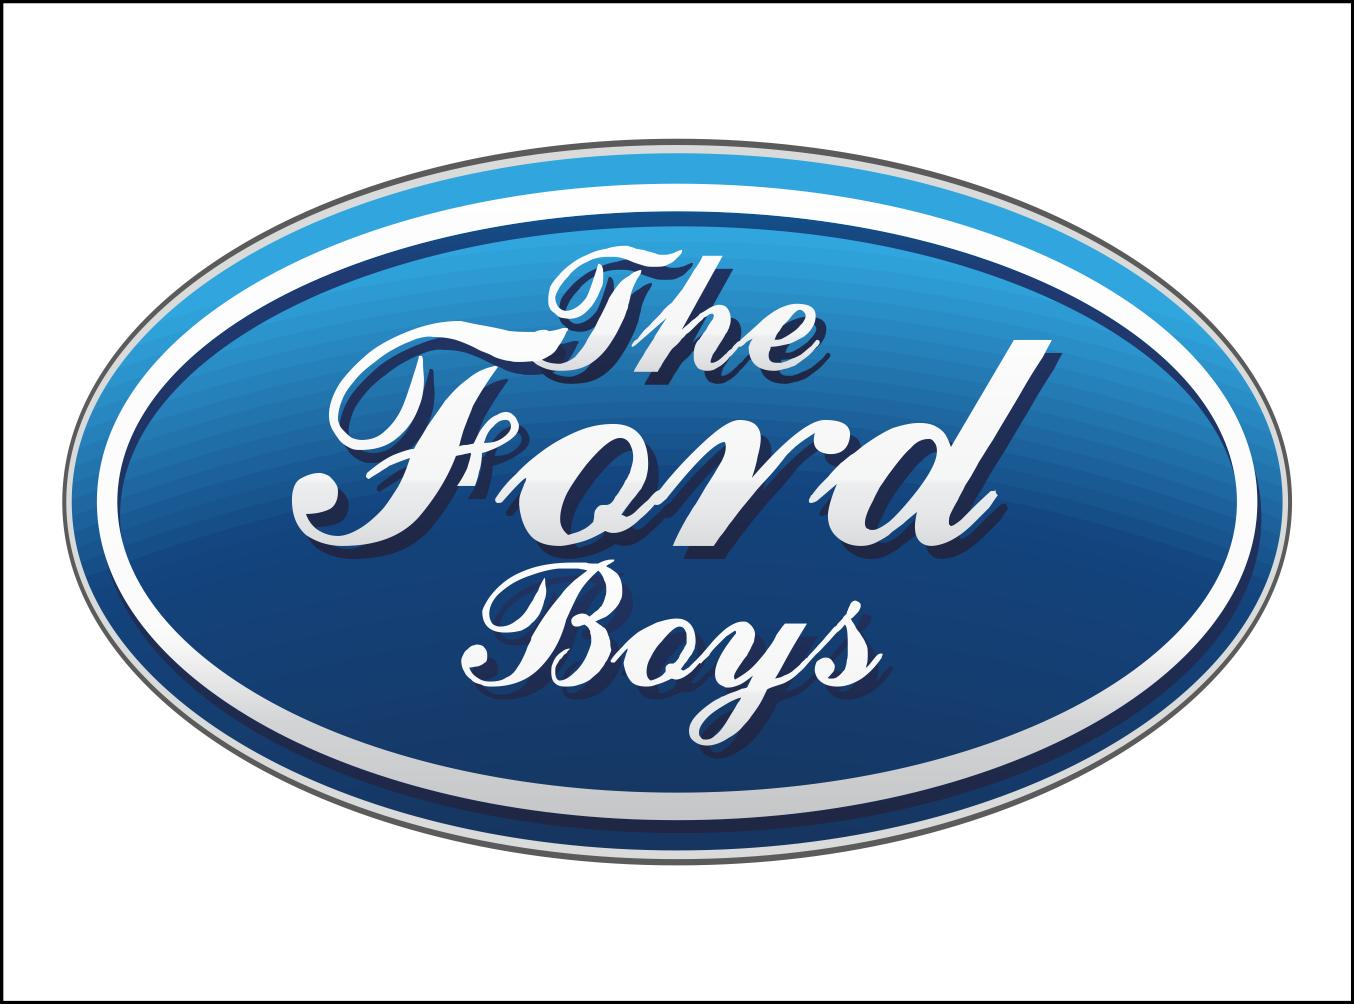 The Ford Boys logo